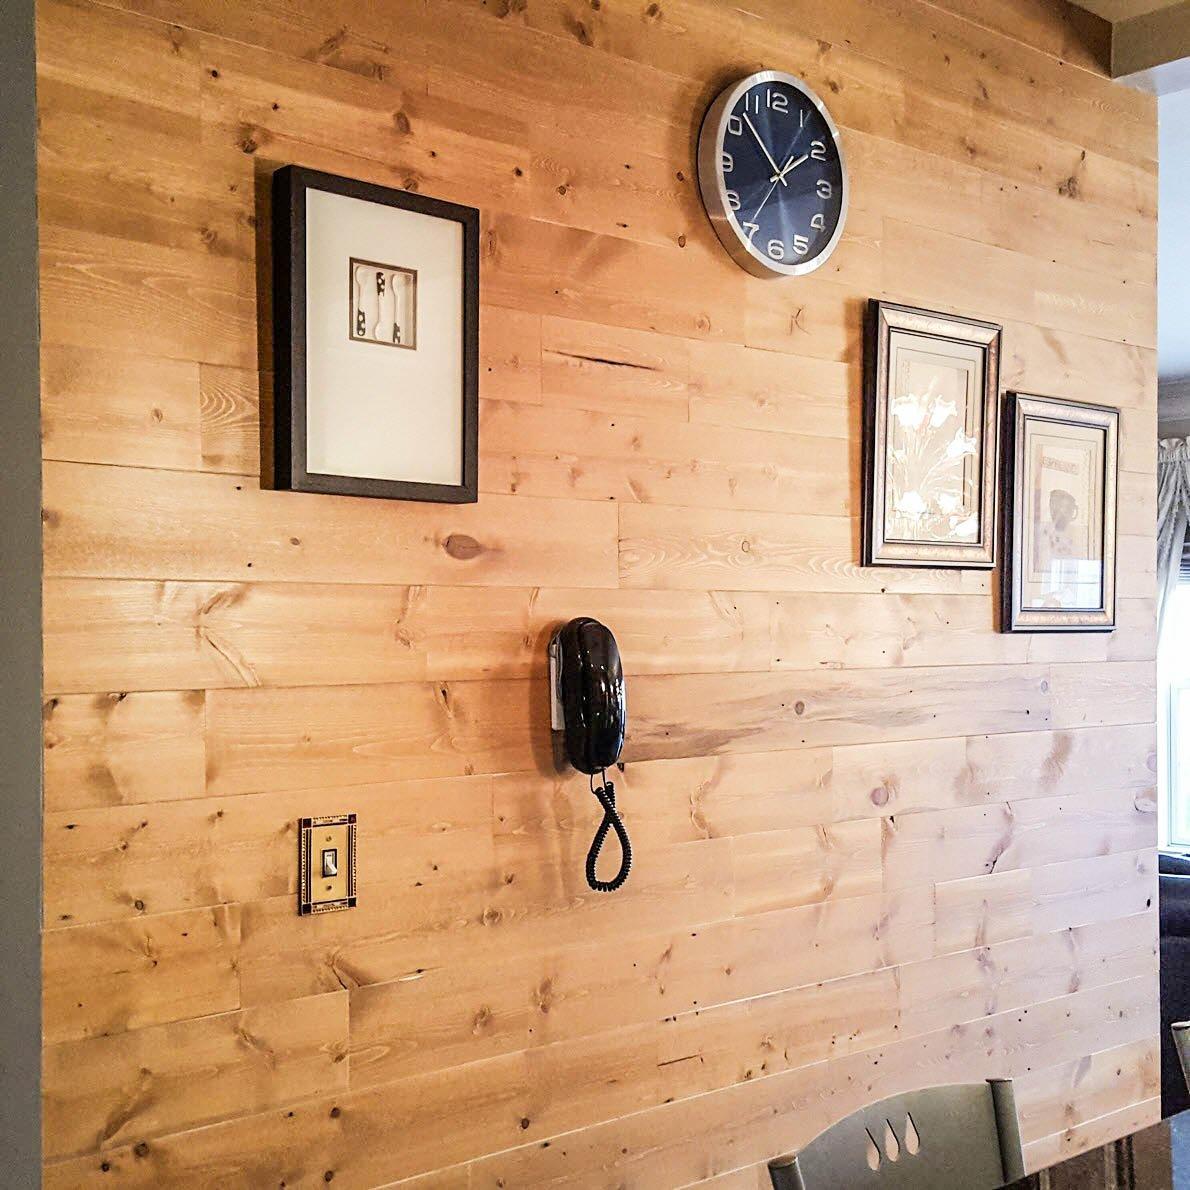 Stikwood - A Stunning DIY Peel and Stik Wood Planking Solution